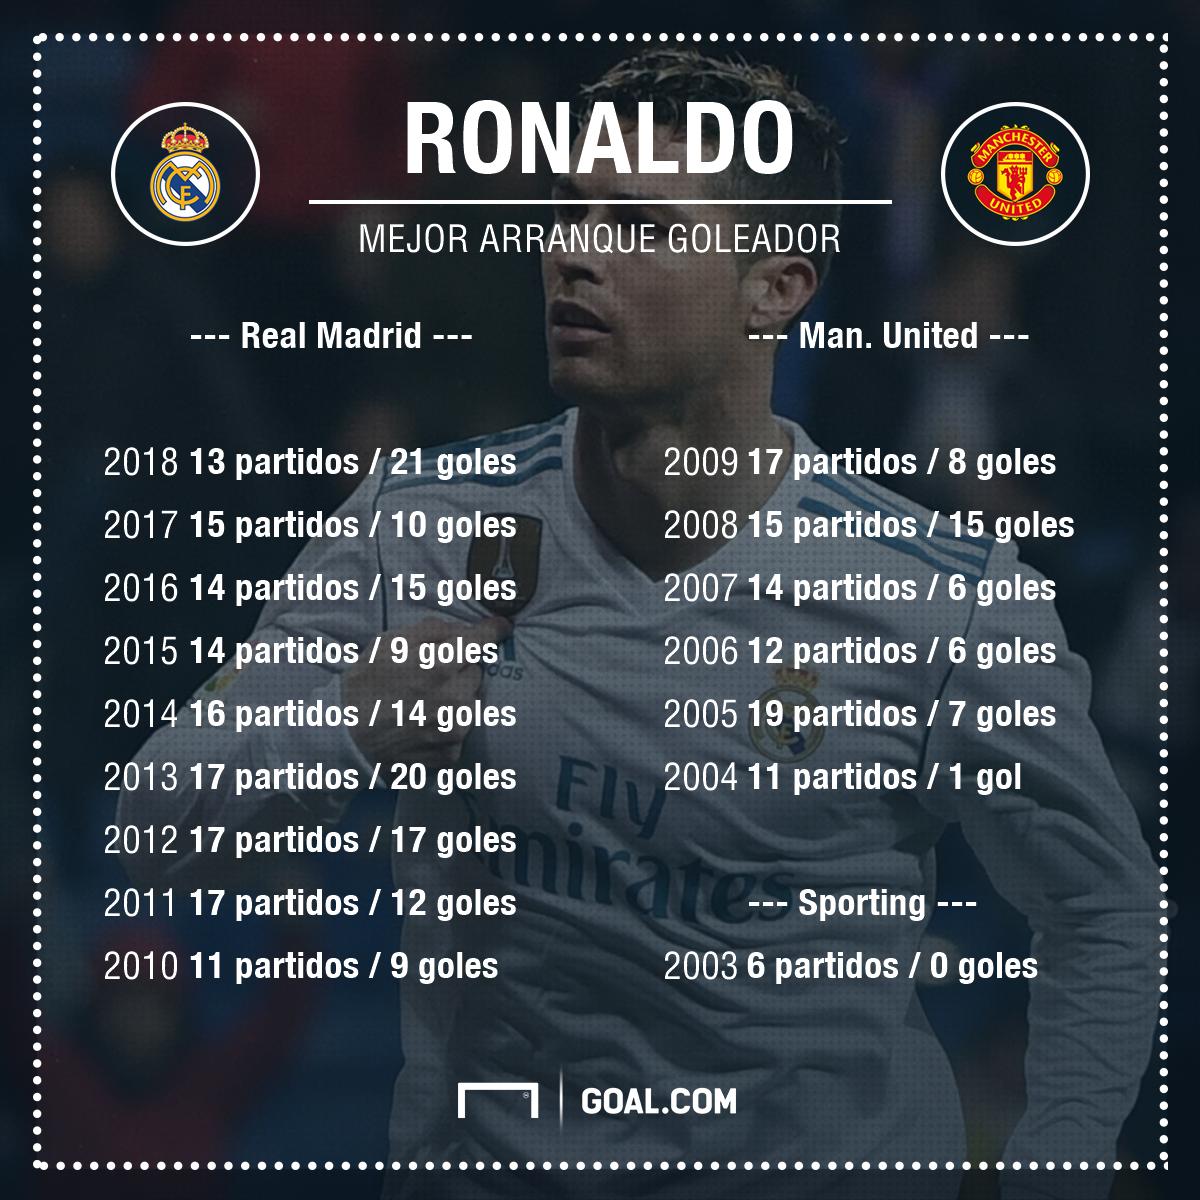 ¿Soberbia total? Ronaldo se admira profundamente: